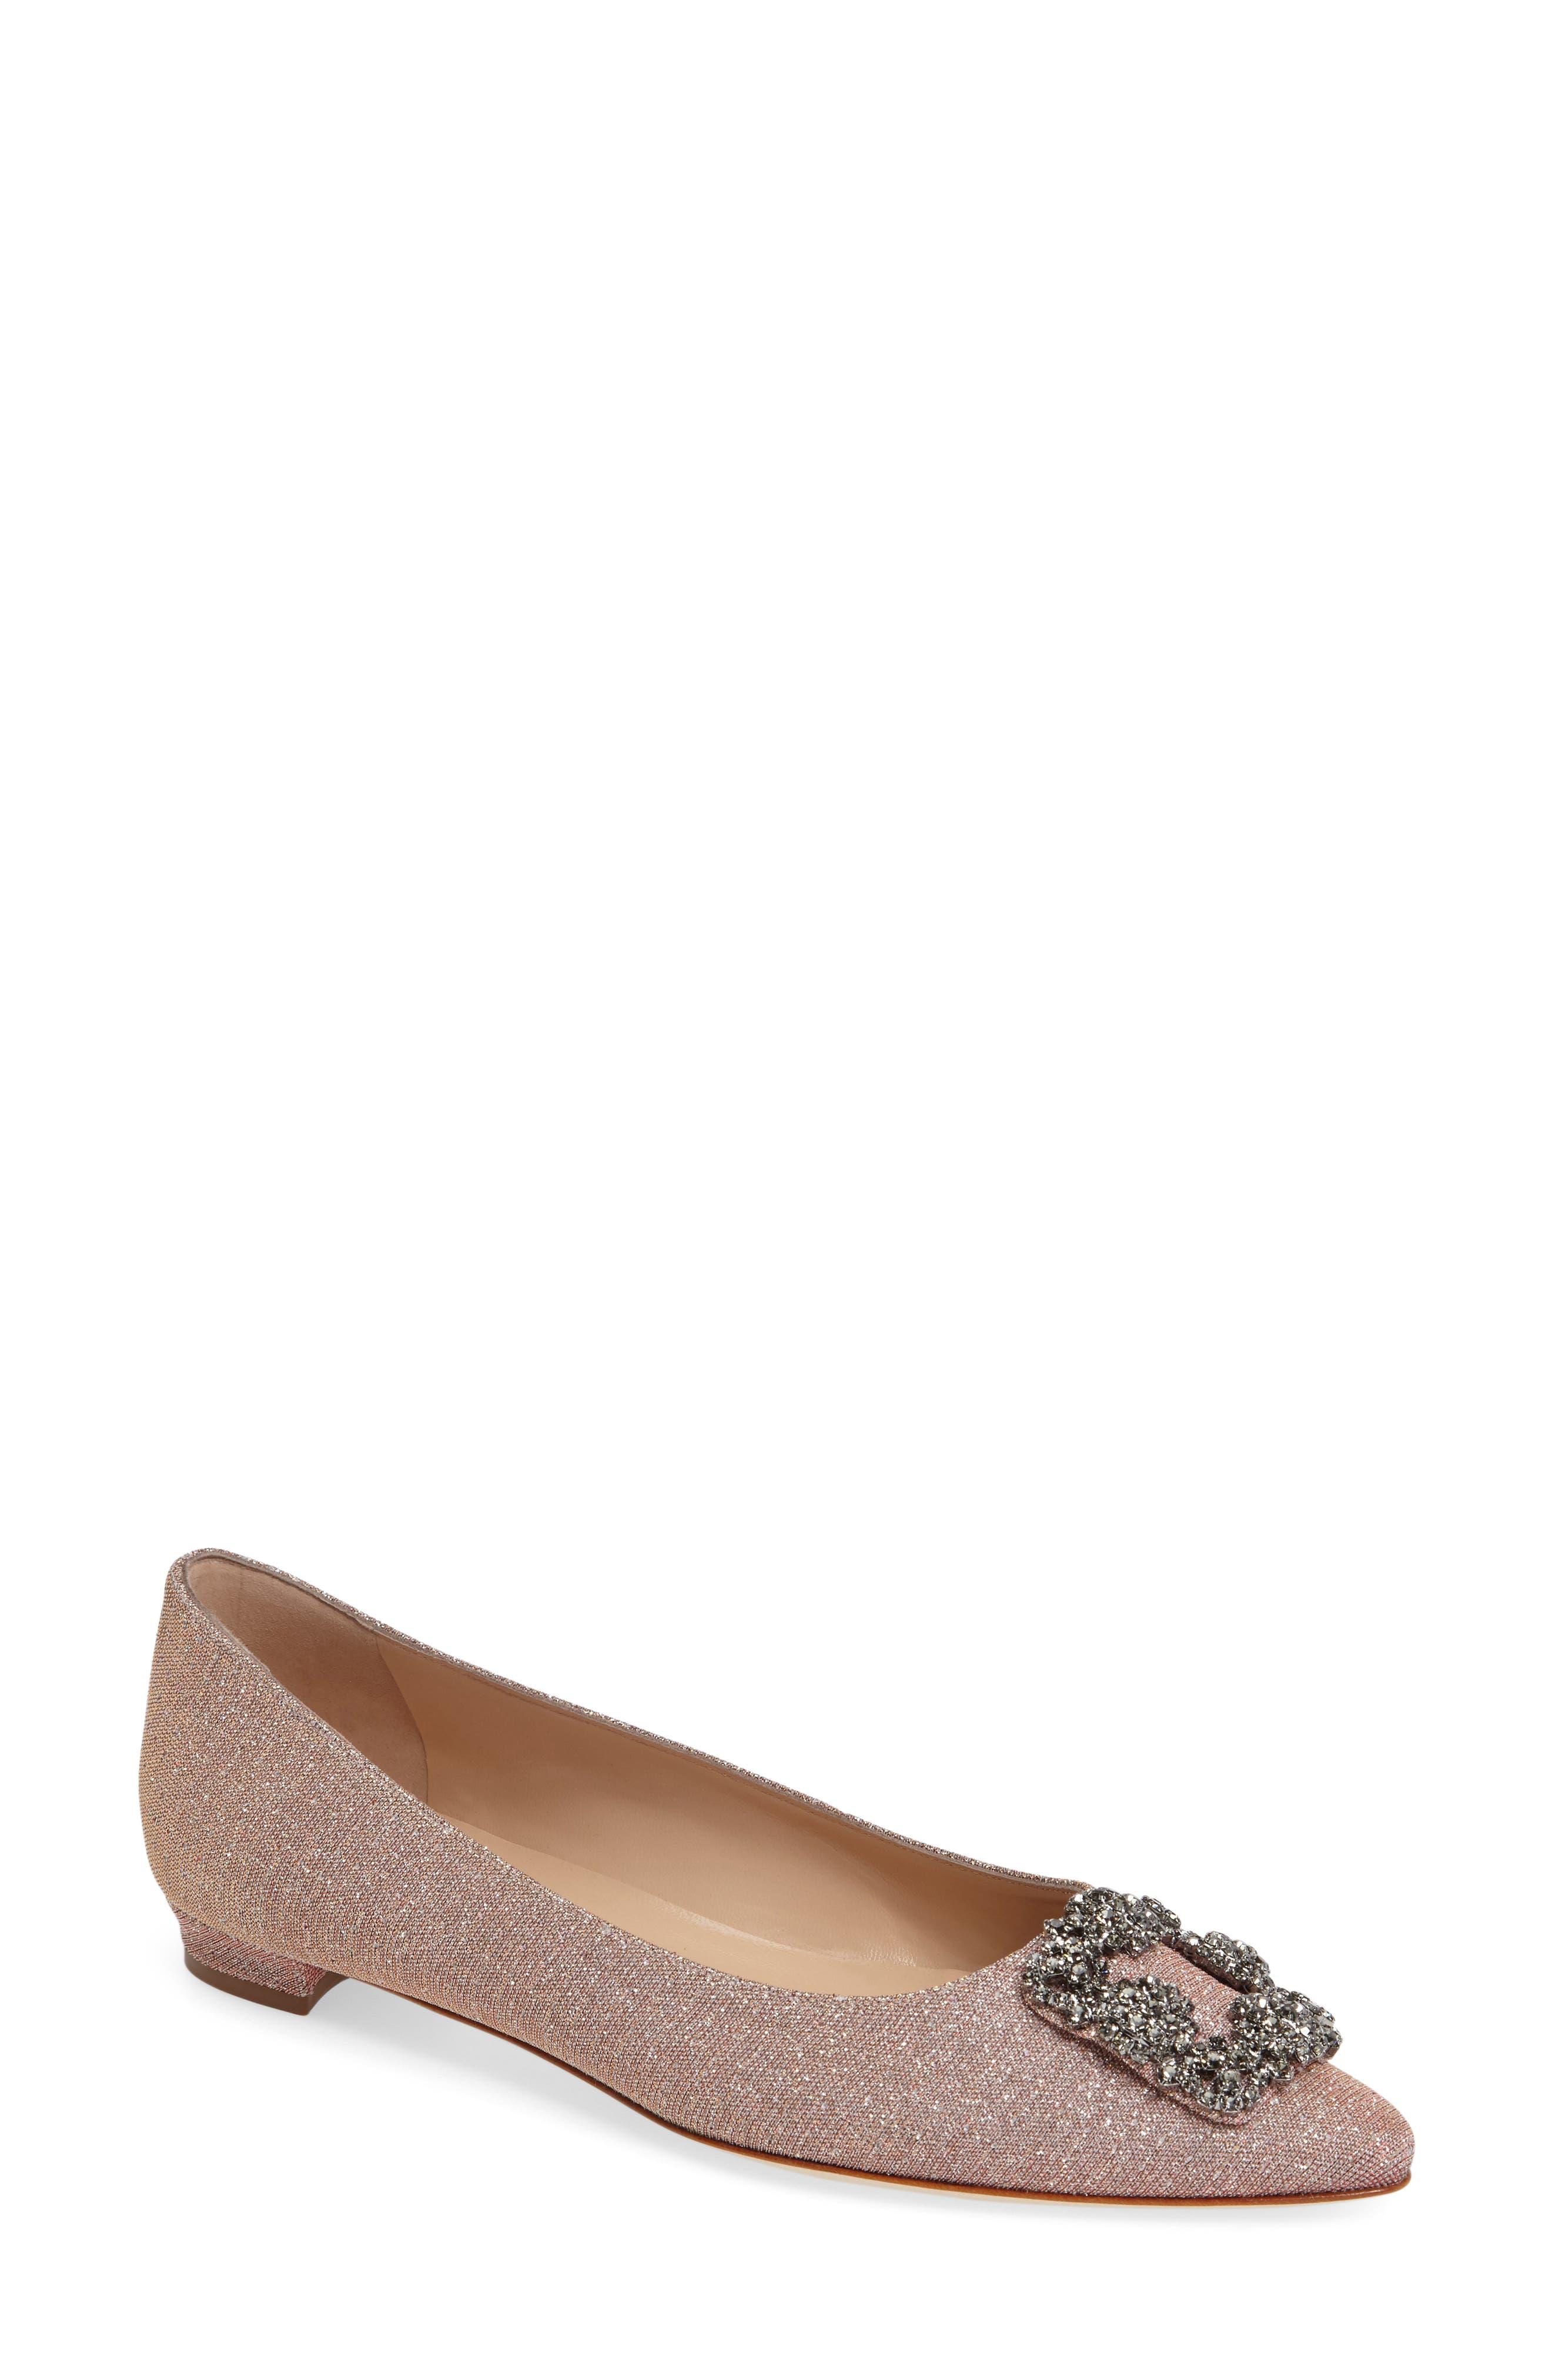 MANOLO BLAHNIK 'Hangisi' Jeweled Pointy Toe Flat